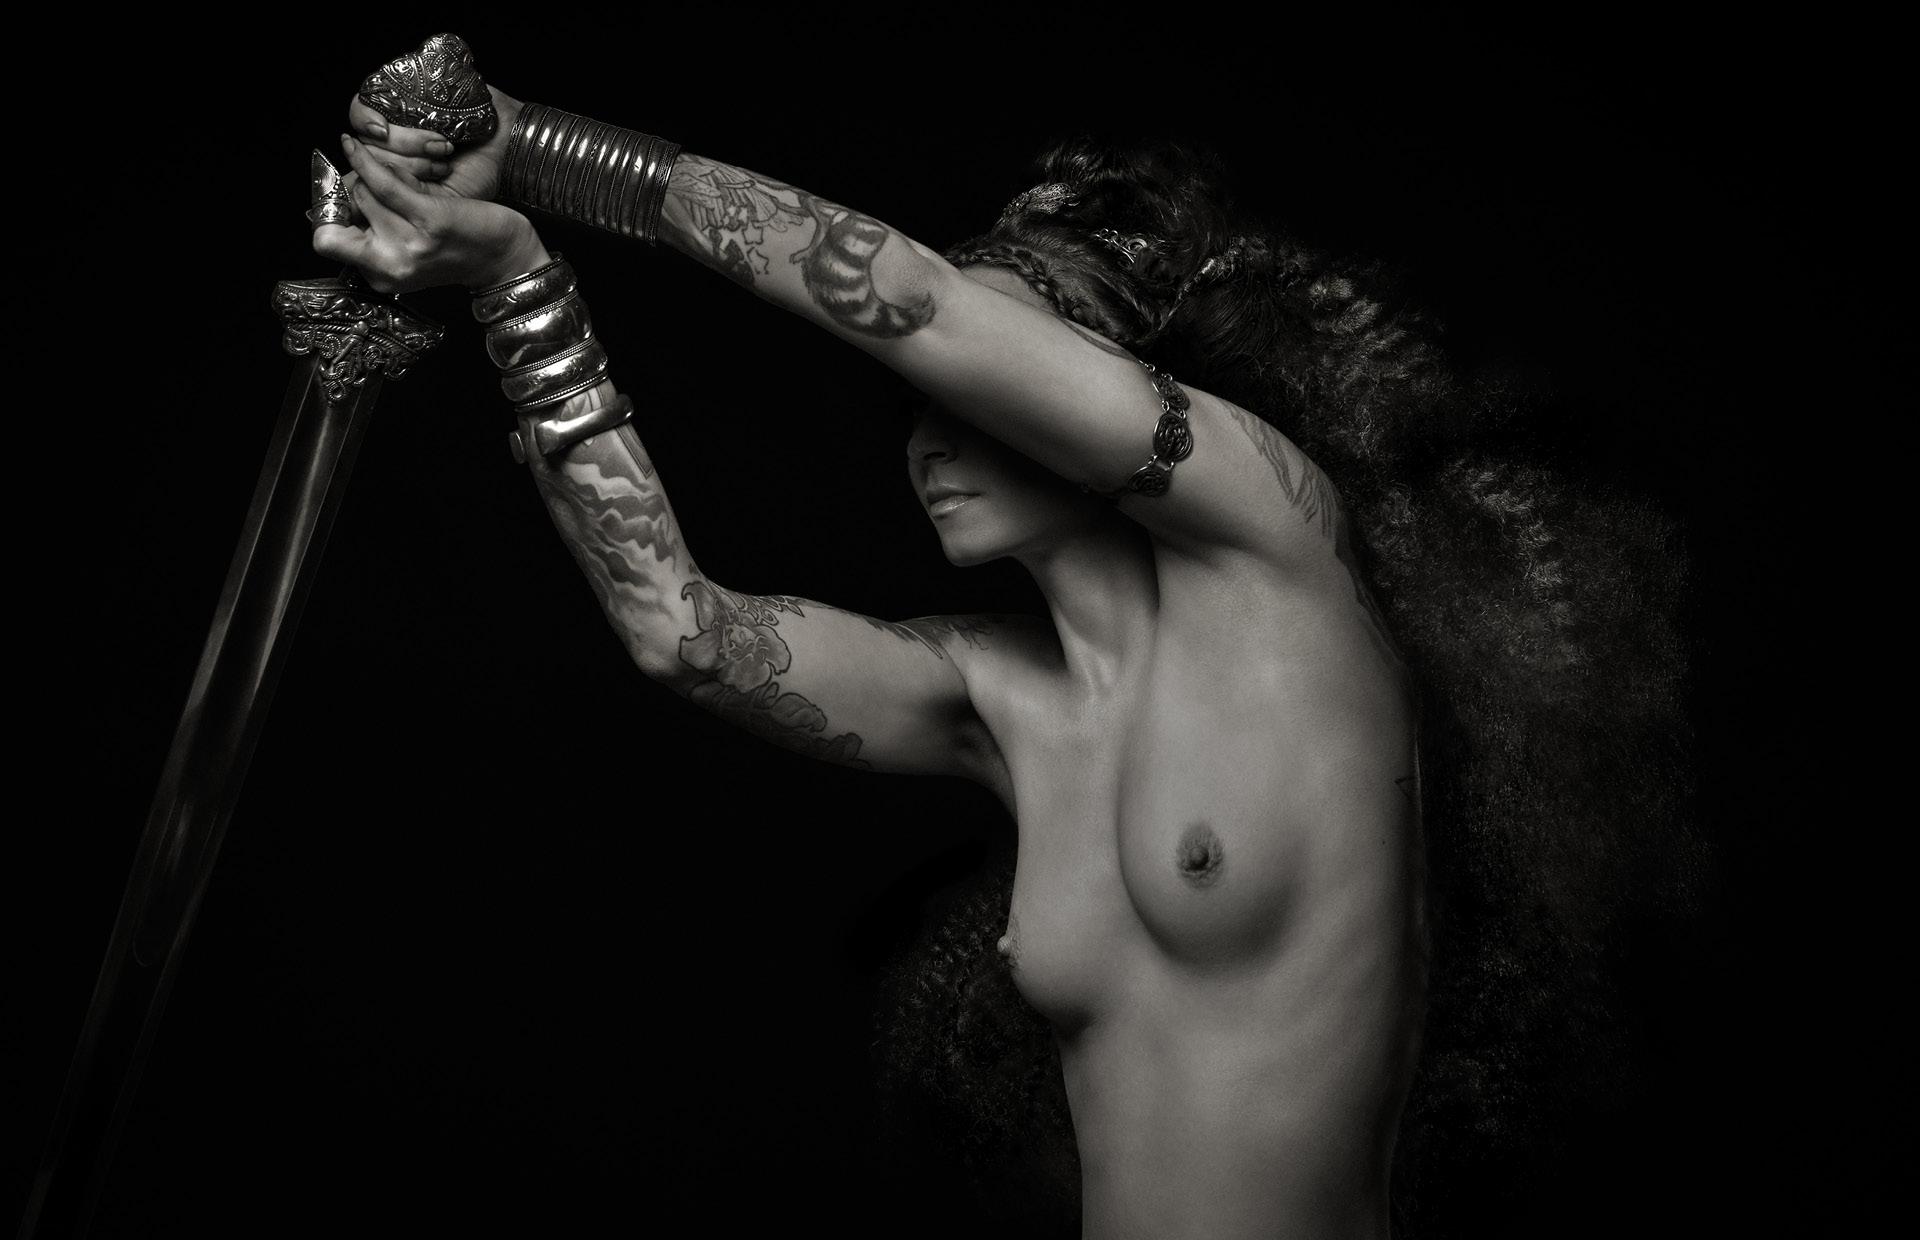 Spirit-&-Flesh-Magazine_Valkyrie-Ink_by-Reka-Nyari_2